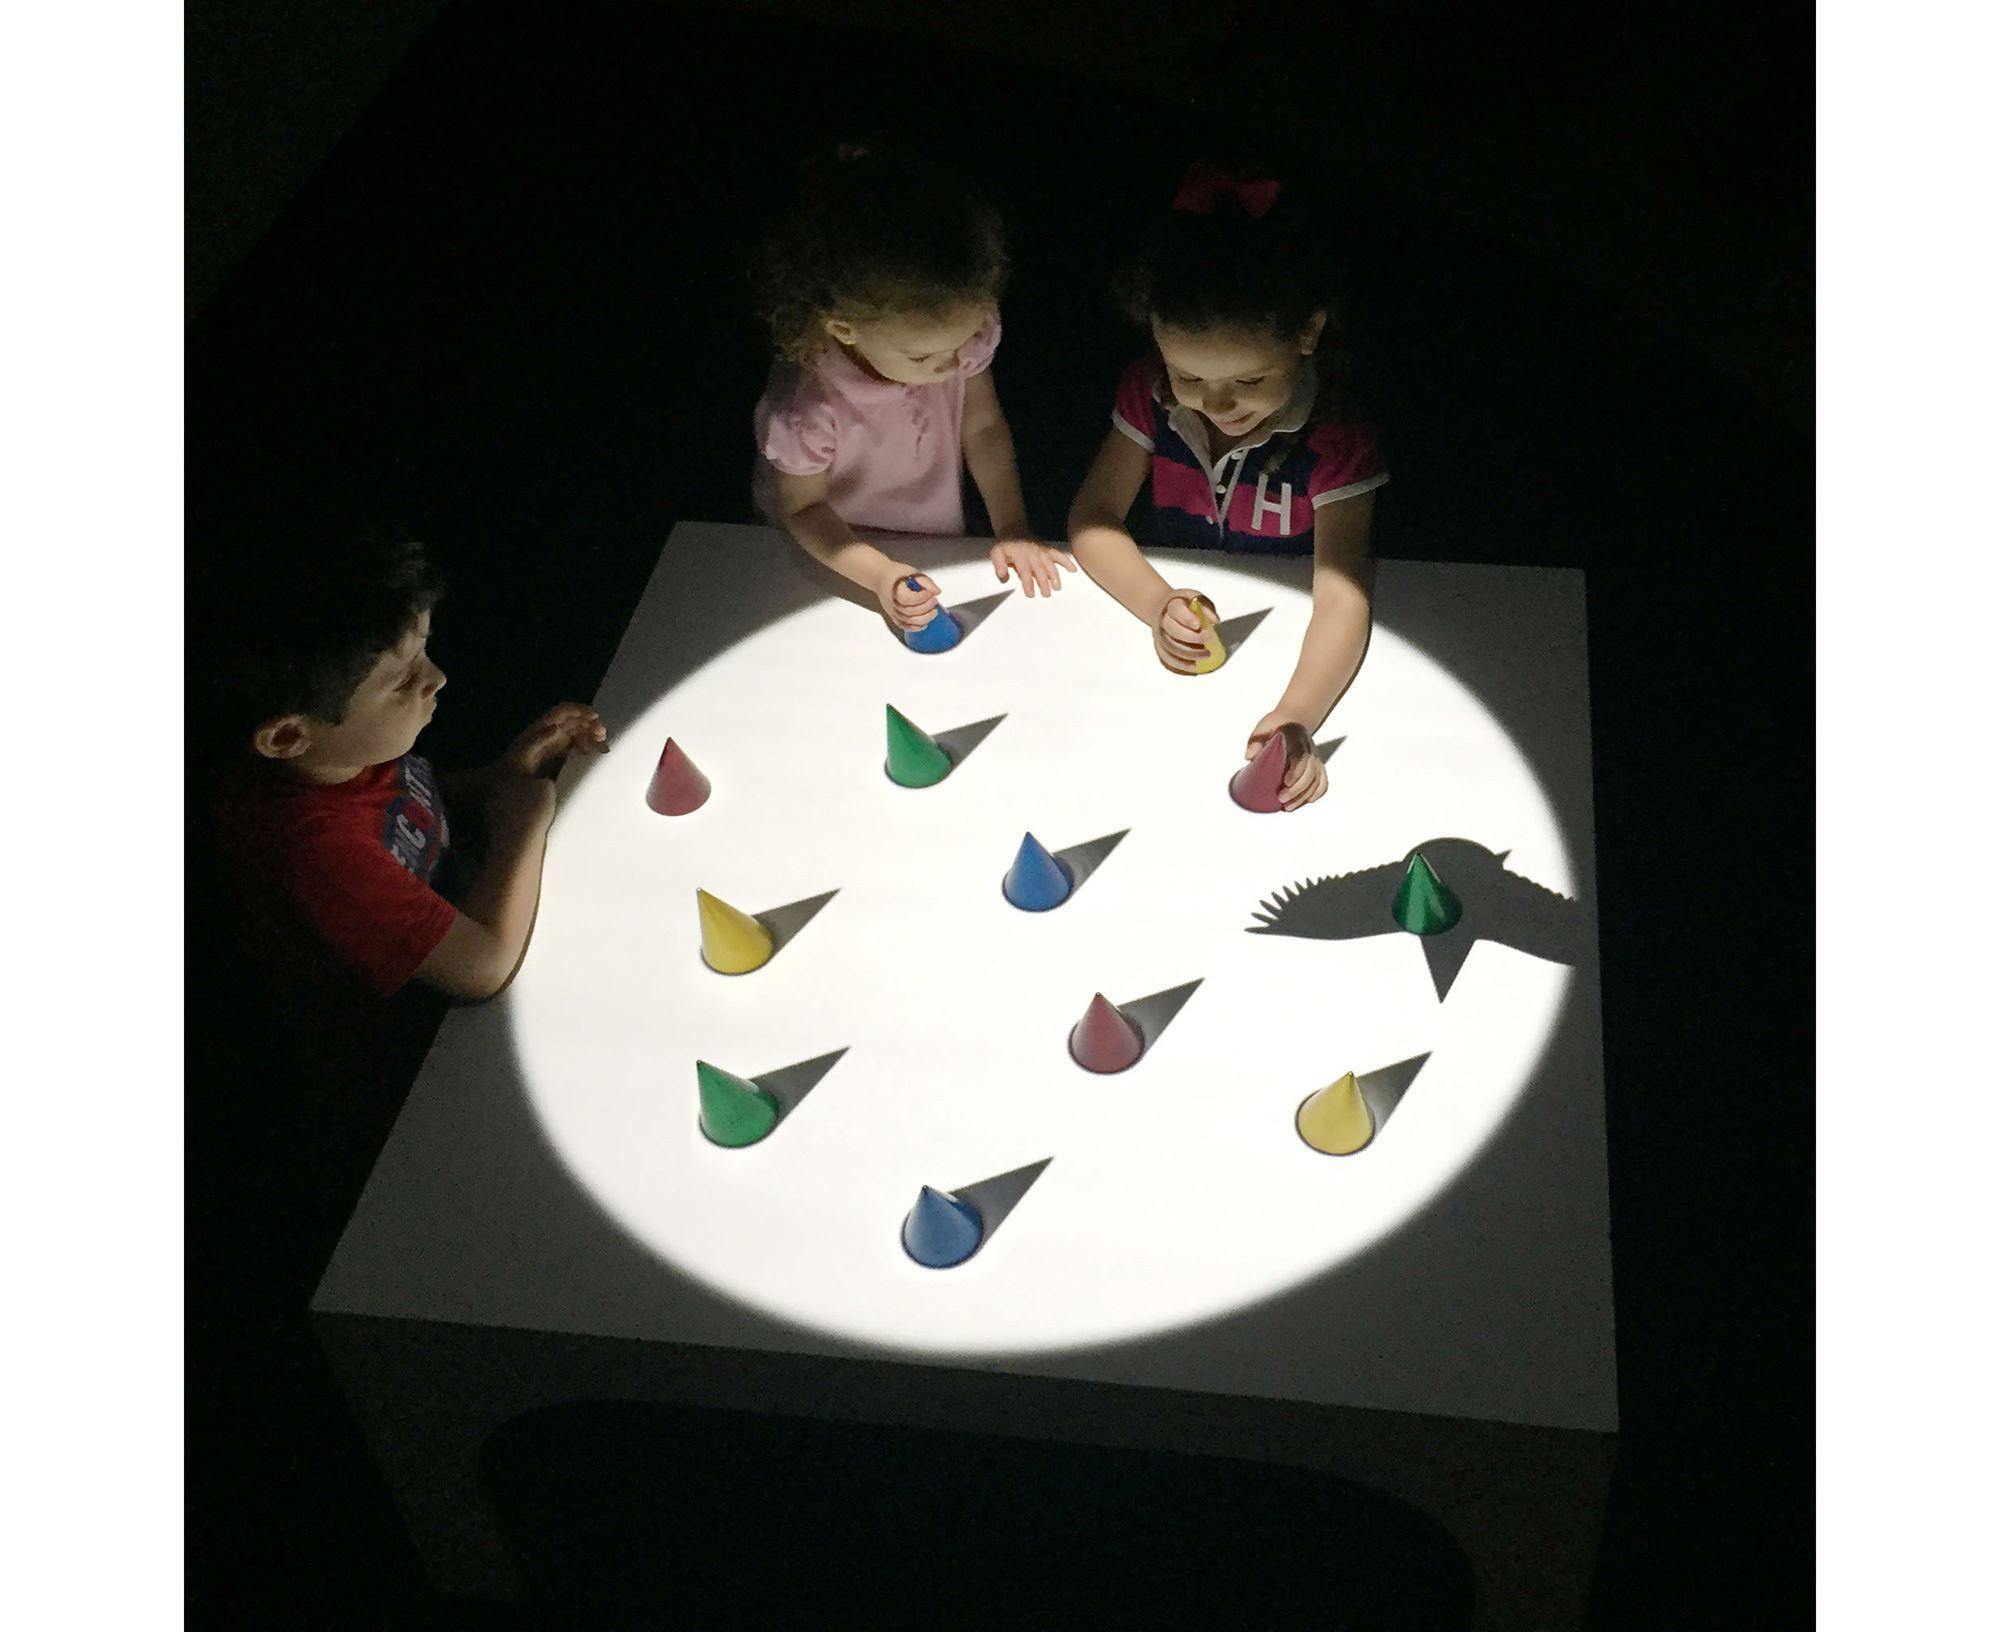 『KAGE』 近森基 第1回デジタルアート(インタラクティブ)部門 大賞受賞作品  (C)Plaplax